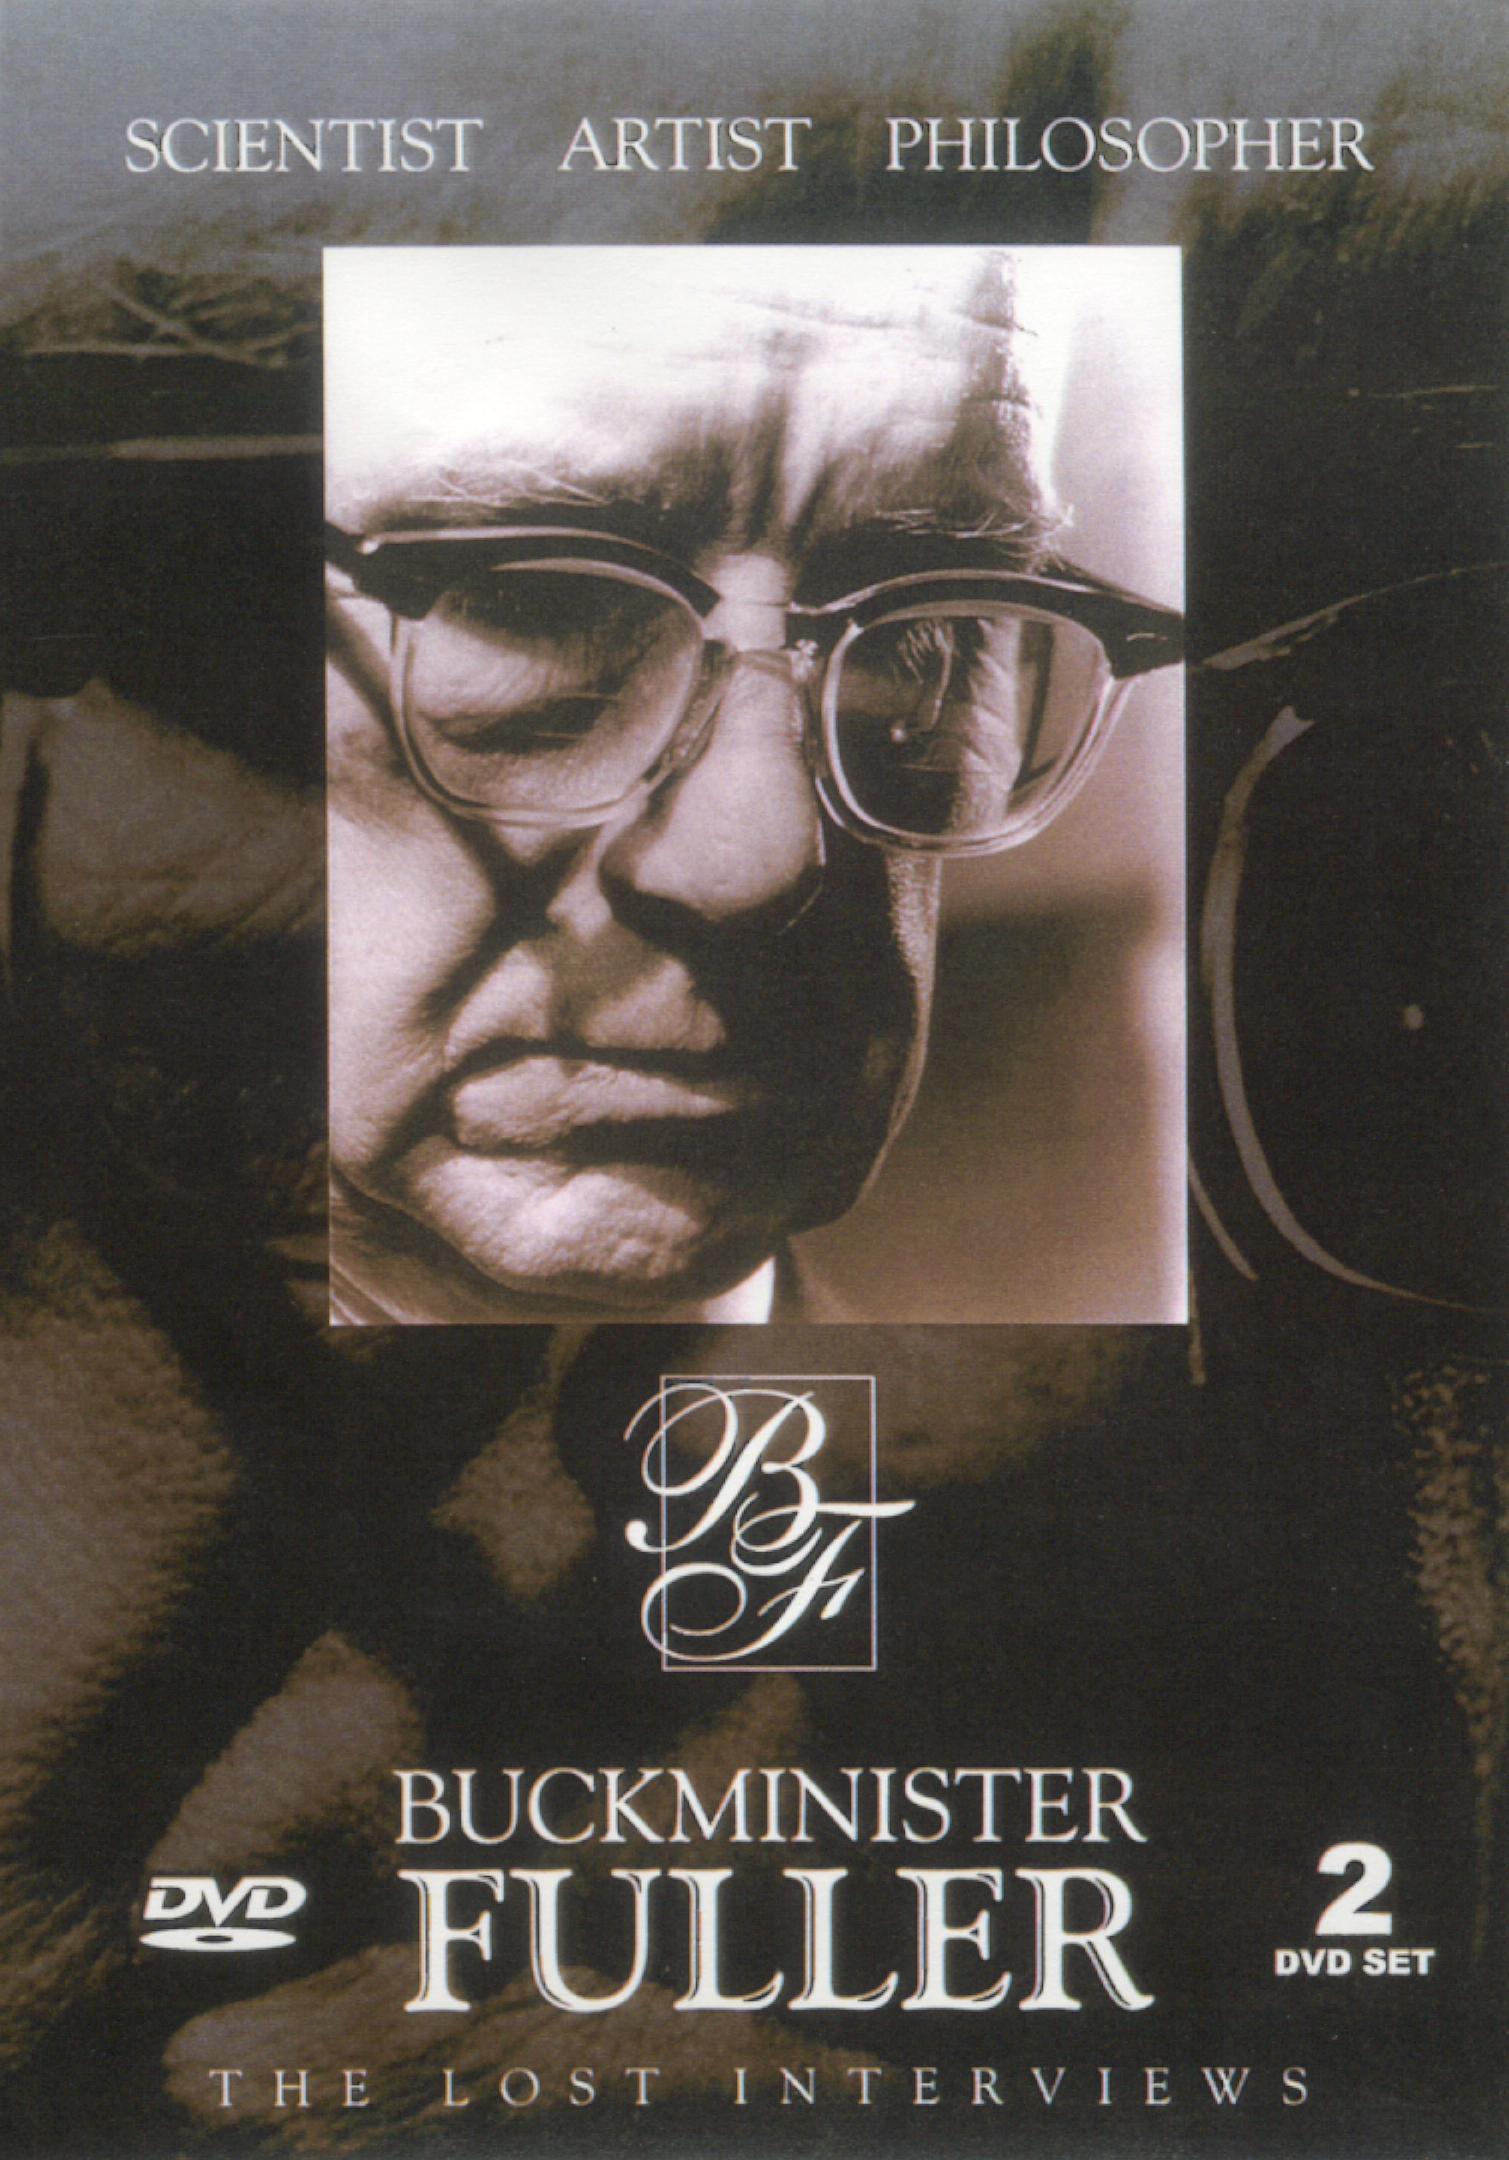 Buckminster Fuller: The Lost Interviews